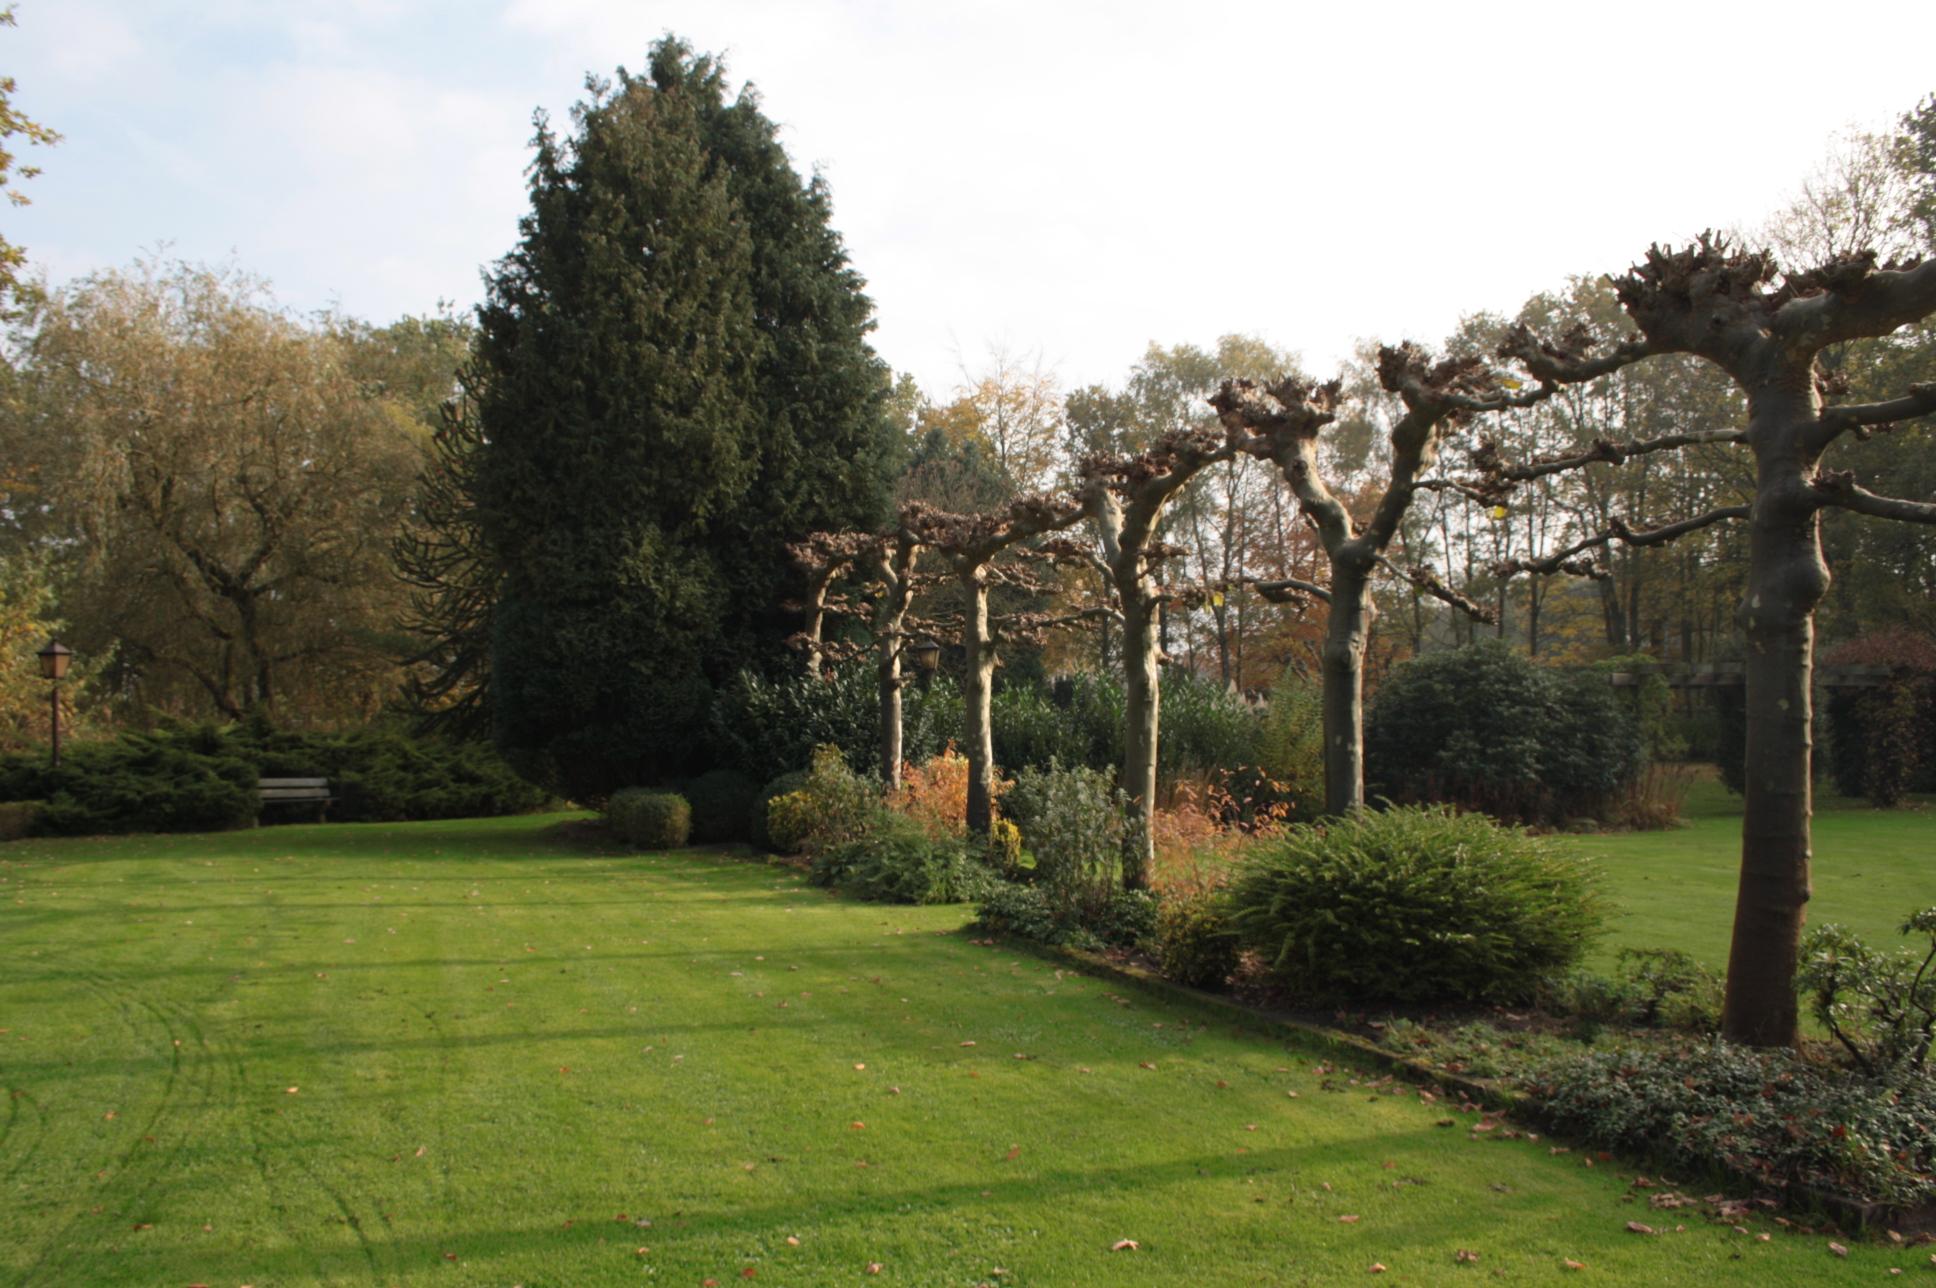 Omgeving – Floralia Park